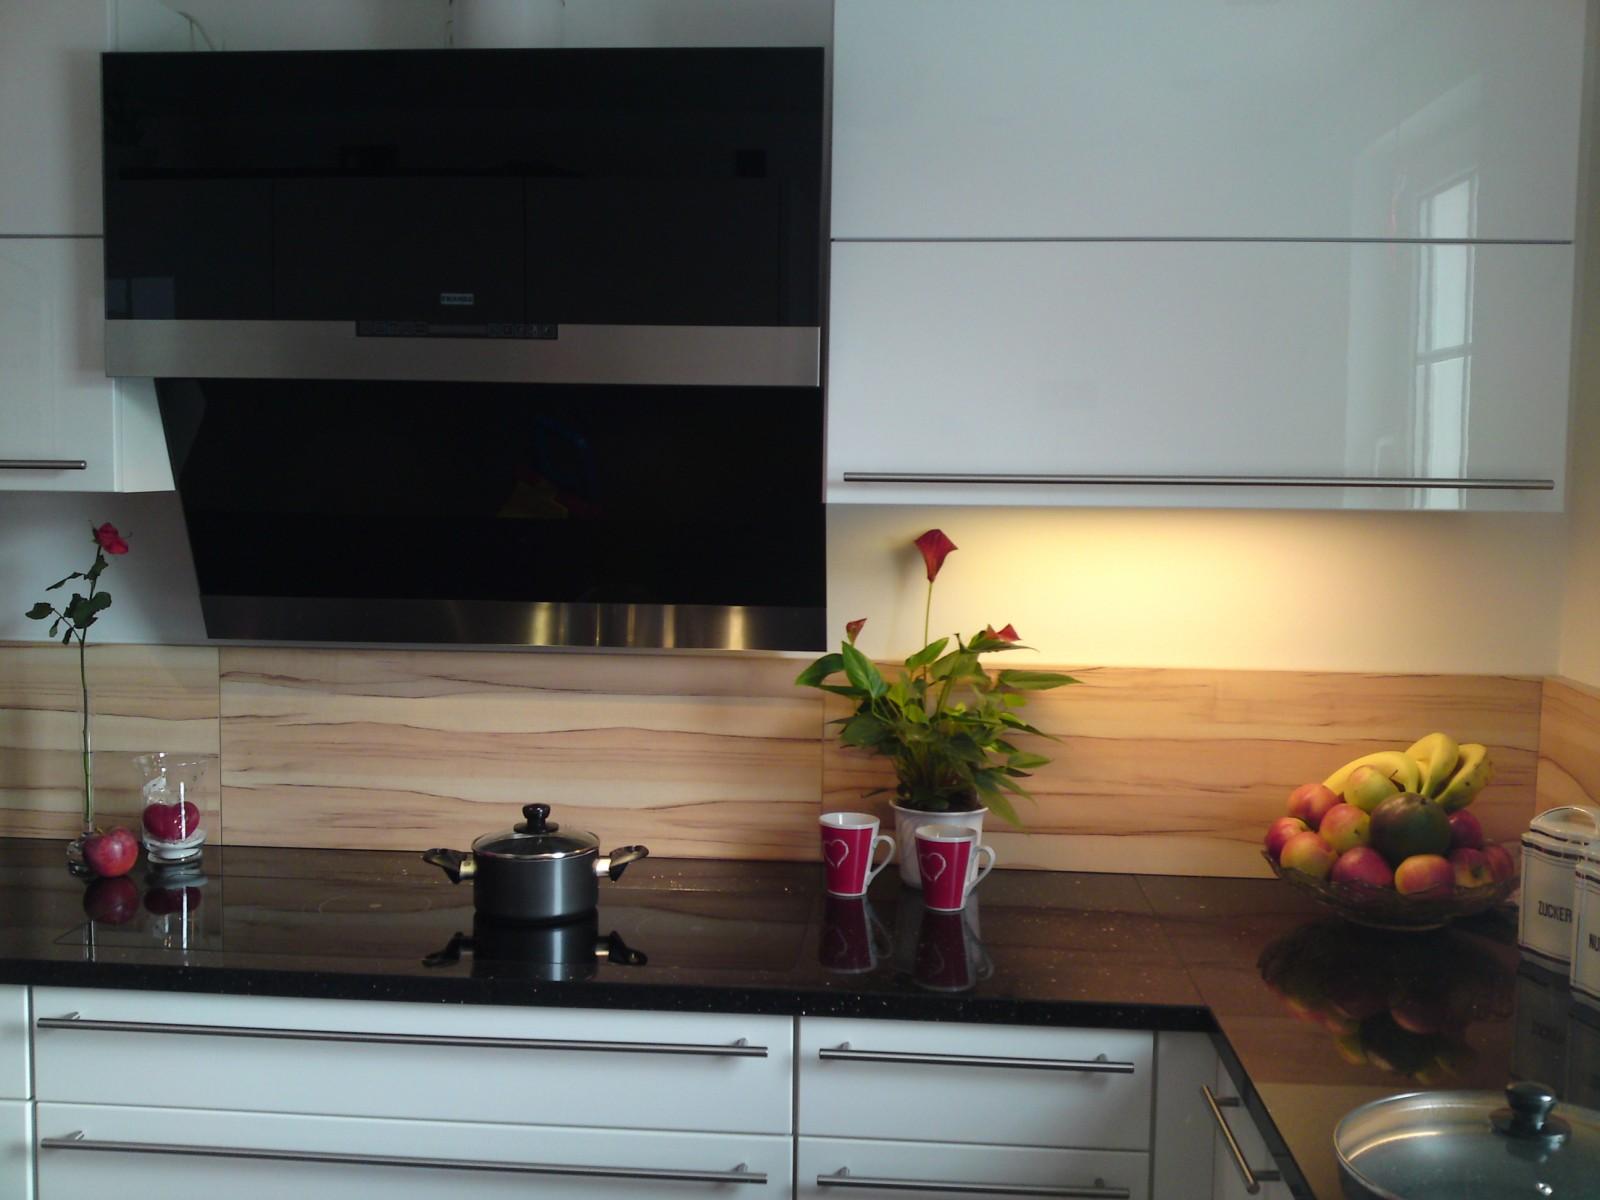 k che 39 meine k che 39 junecat s home zimmerschau. Black Bedroom Furniture Sets. Home Design Ideas